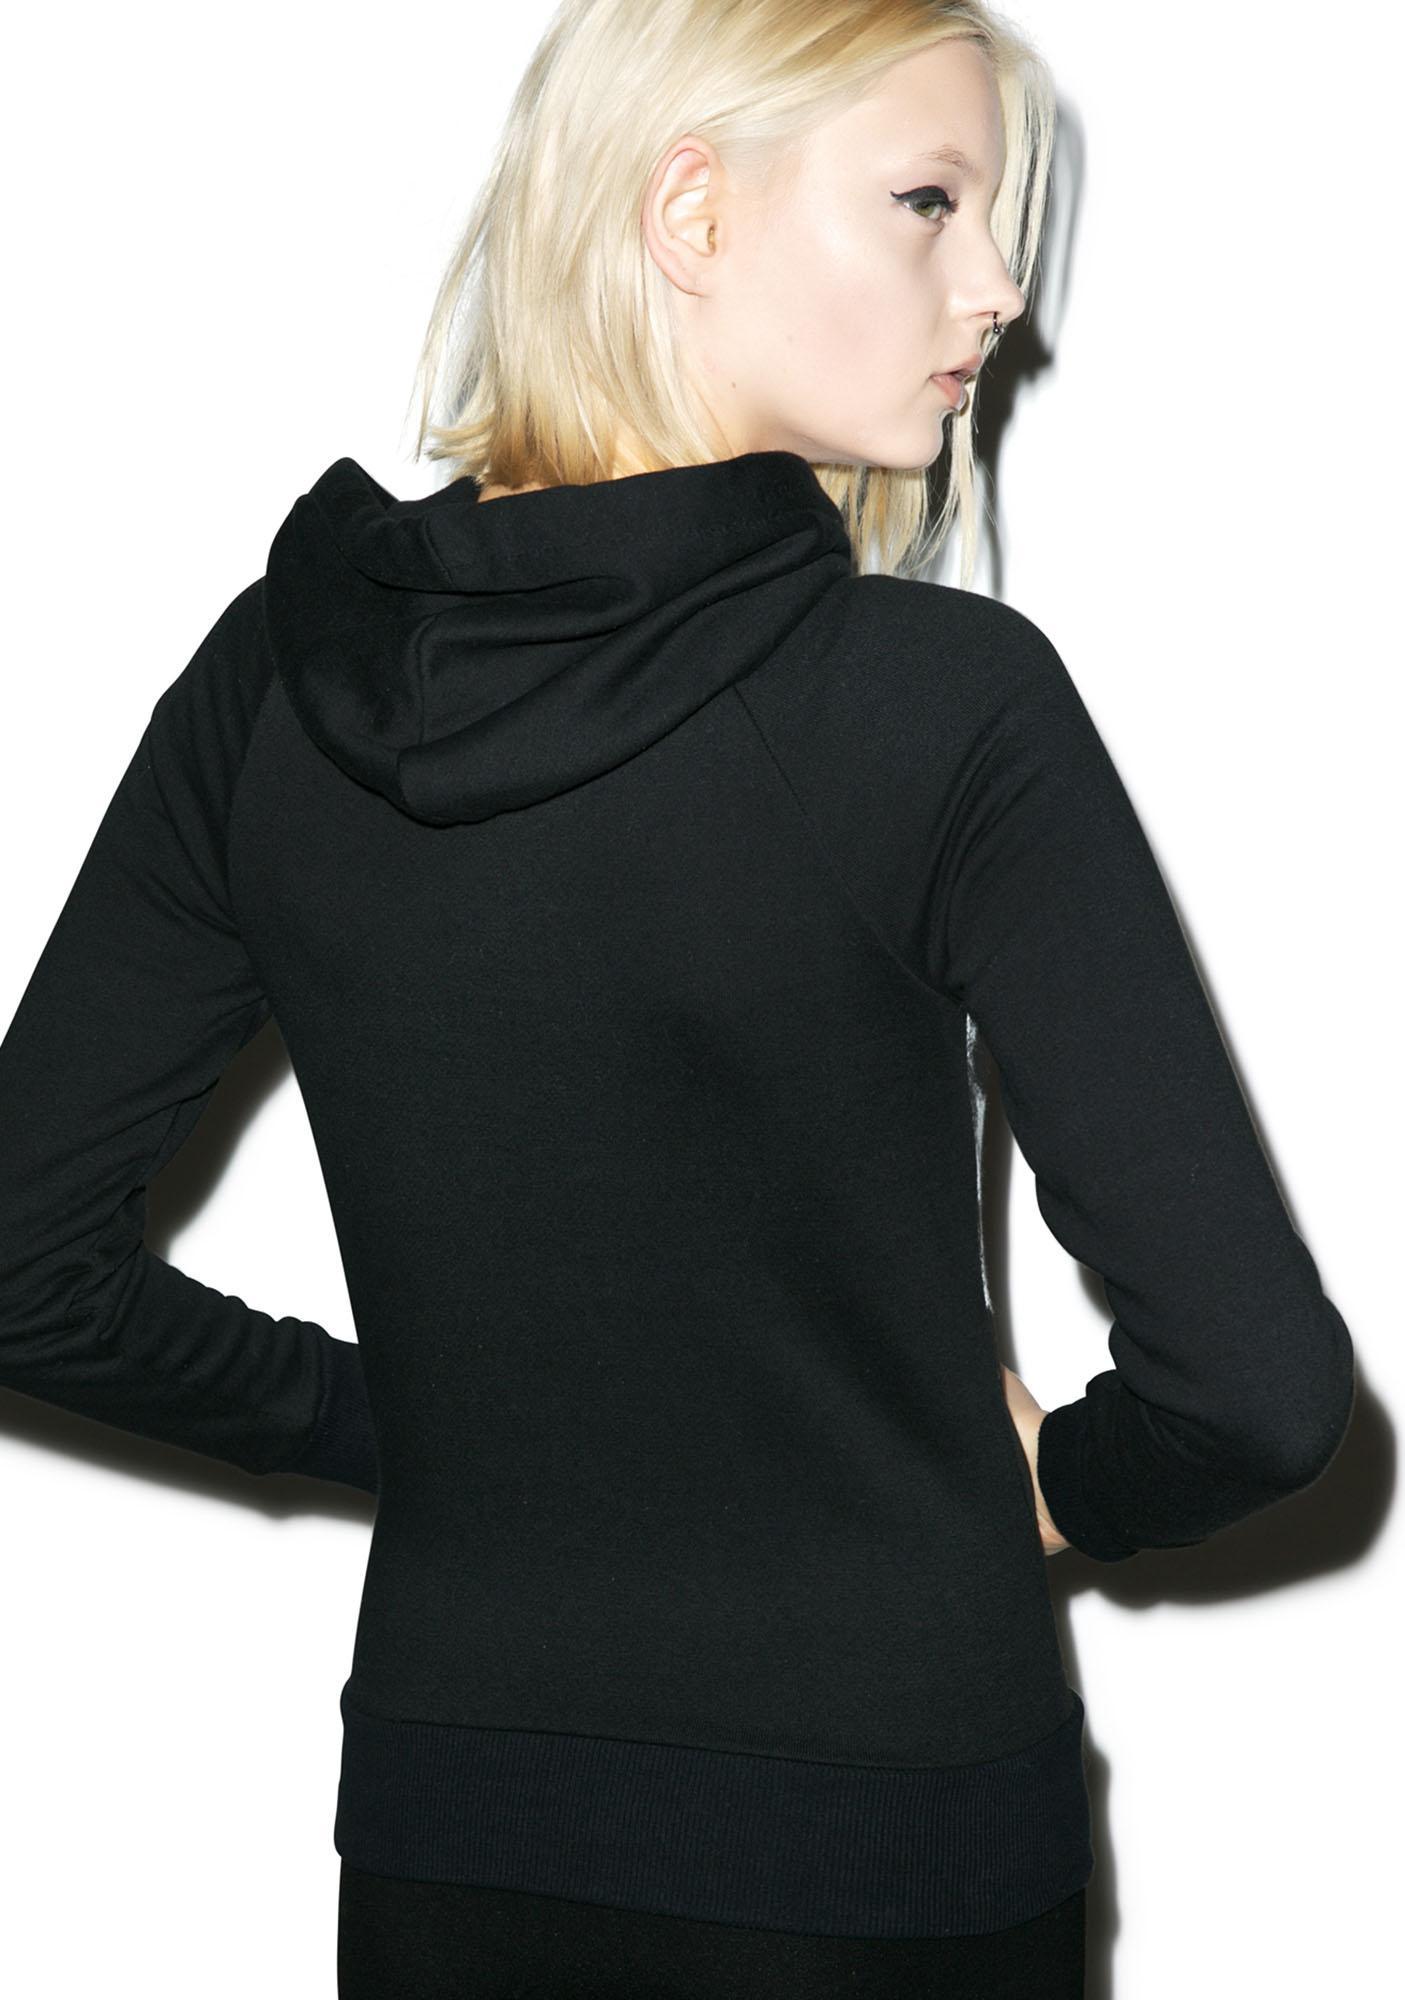 Iron fist hoodie